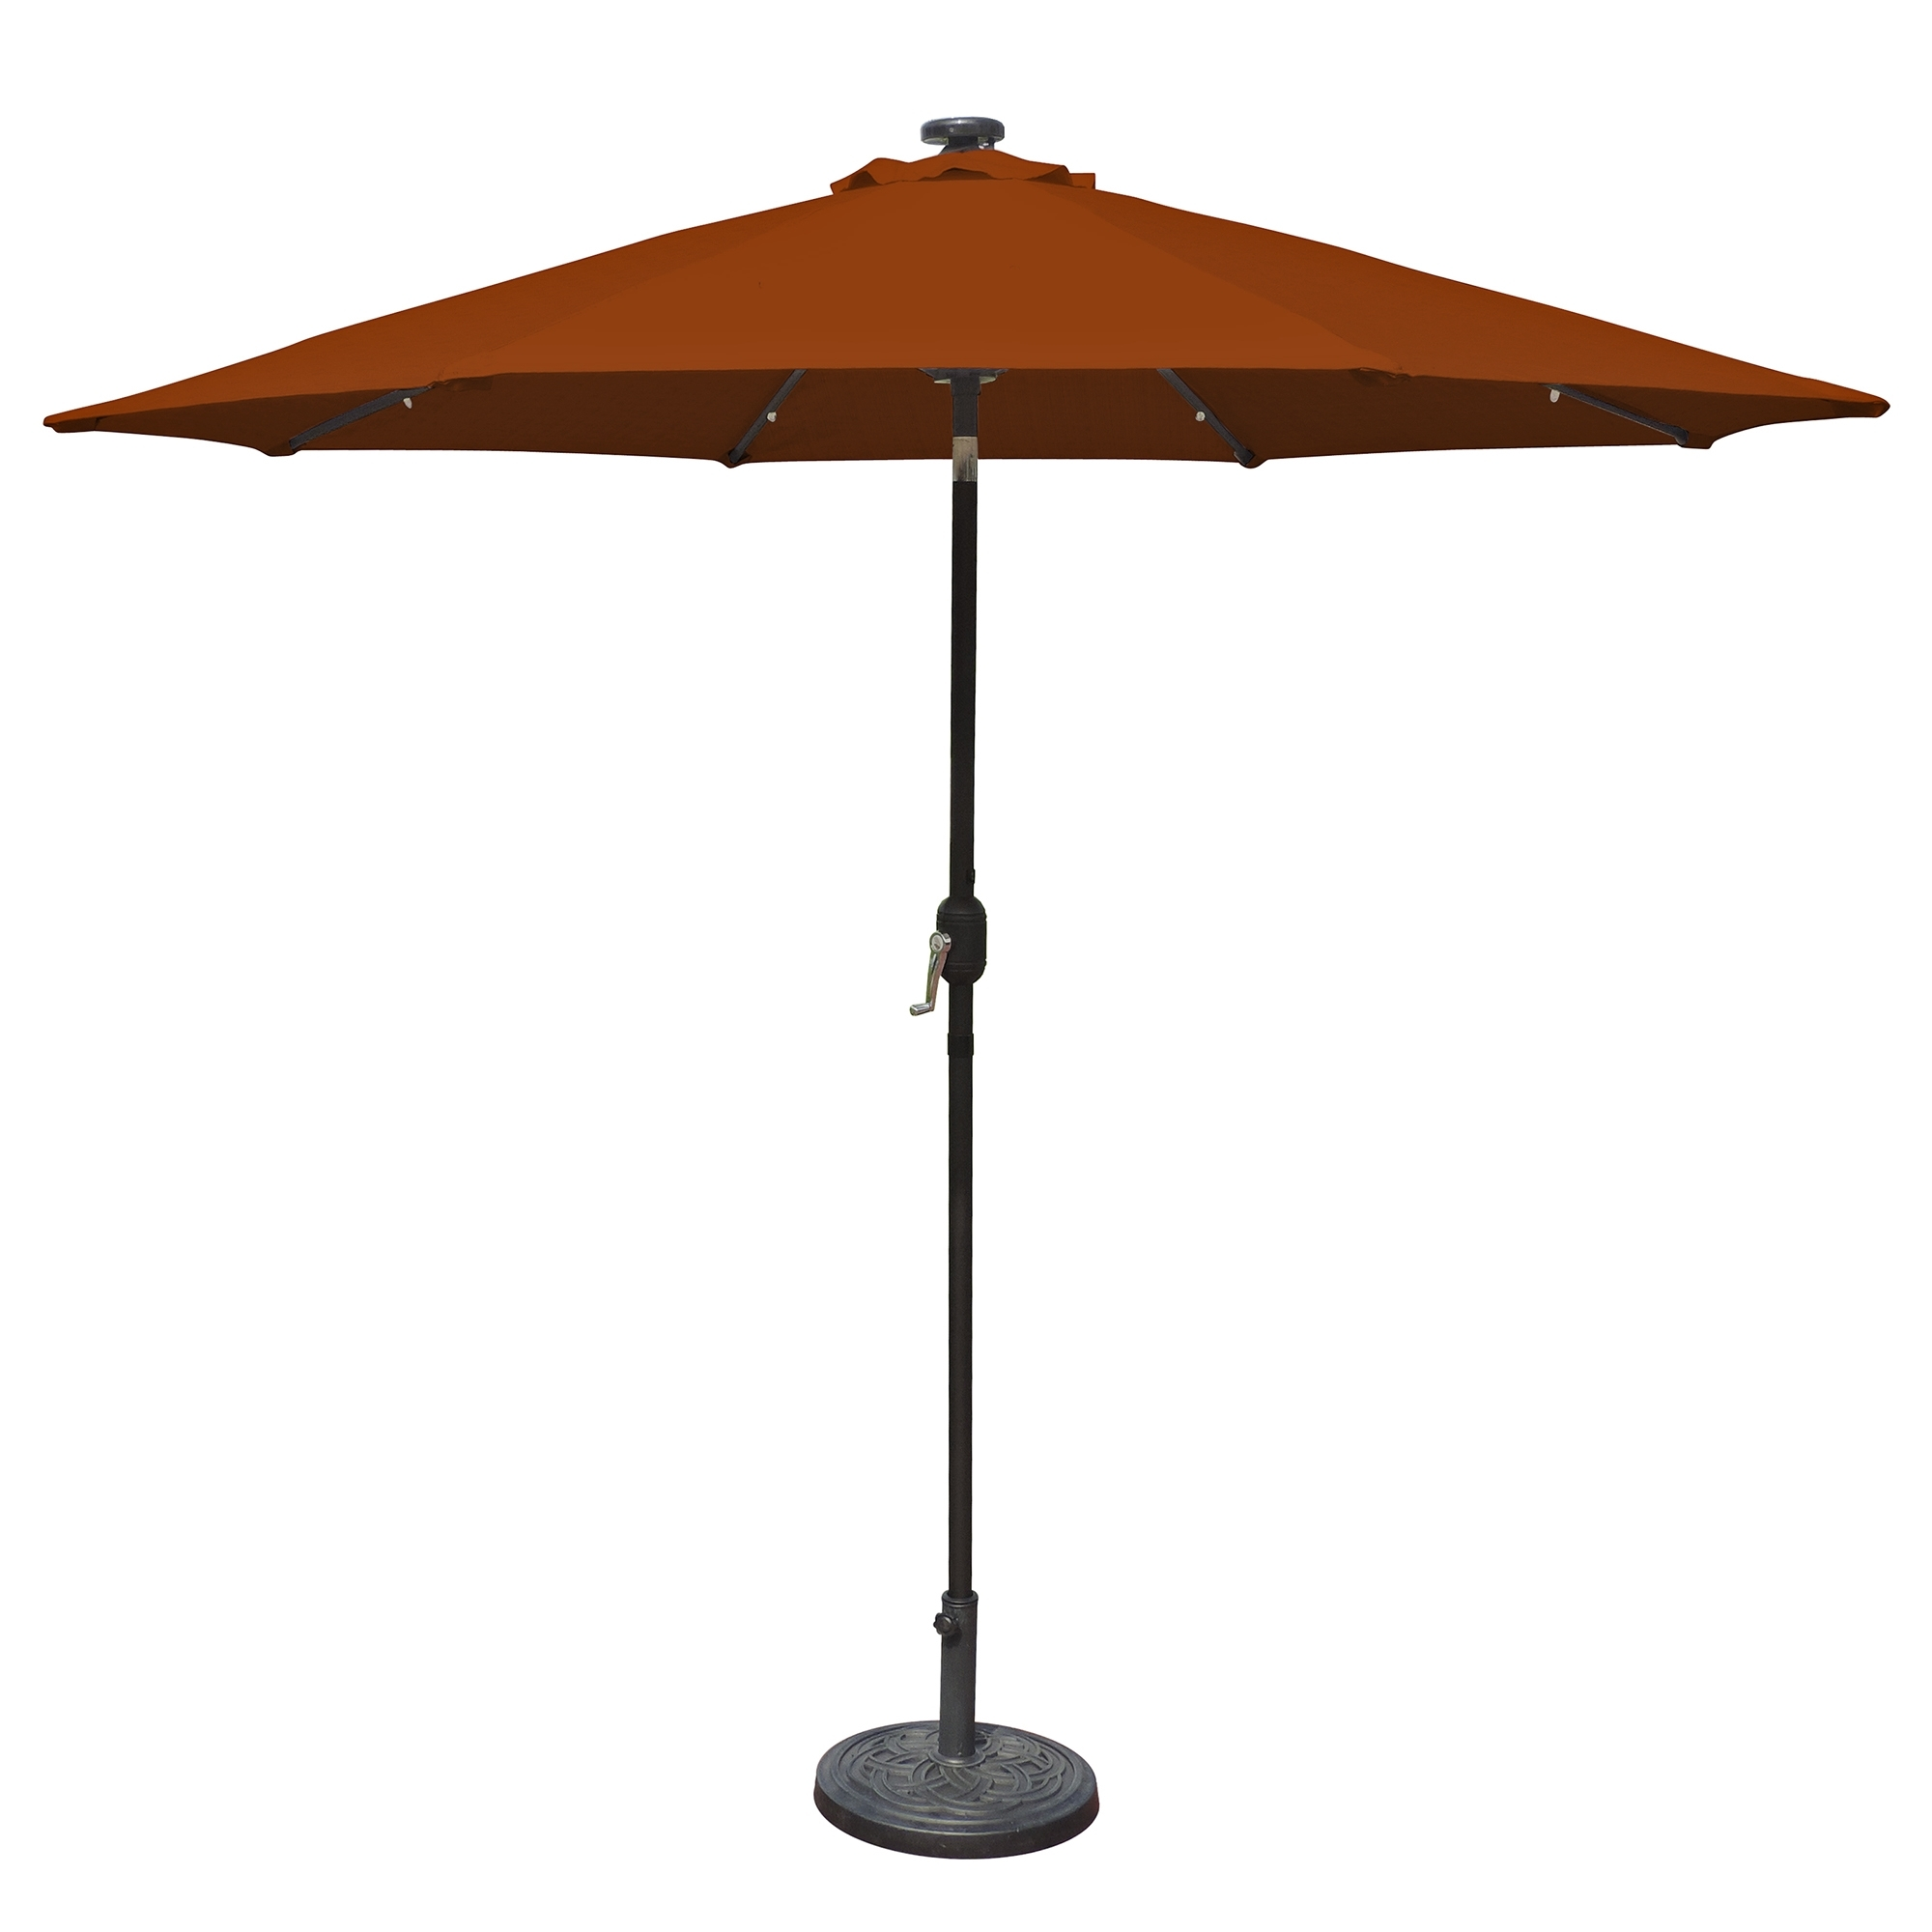 Led Patio Umbrellas Pertaining To Popular Island Umbrella Mirage Fiesta 9 Ft Market Solar Led Auto Tilt Patio (View 10 of 20)